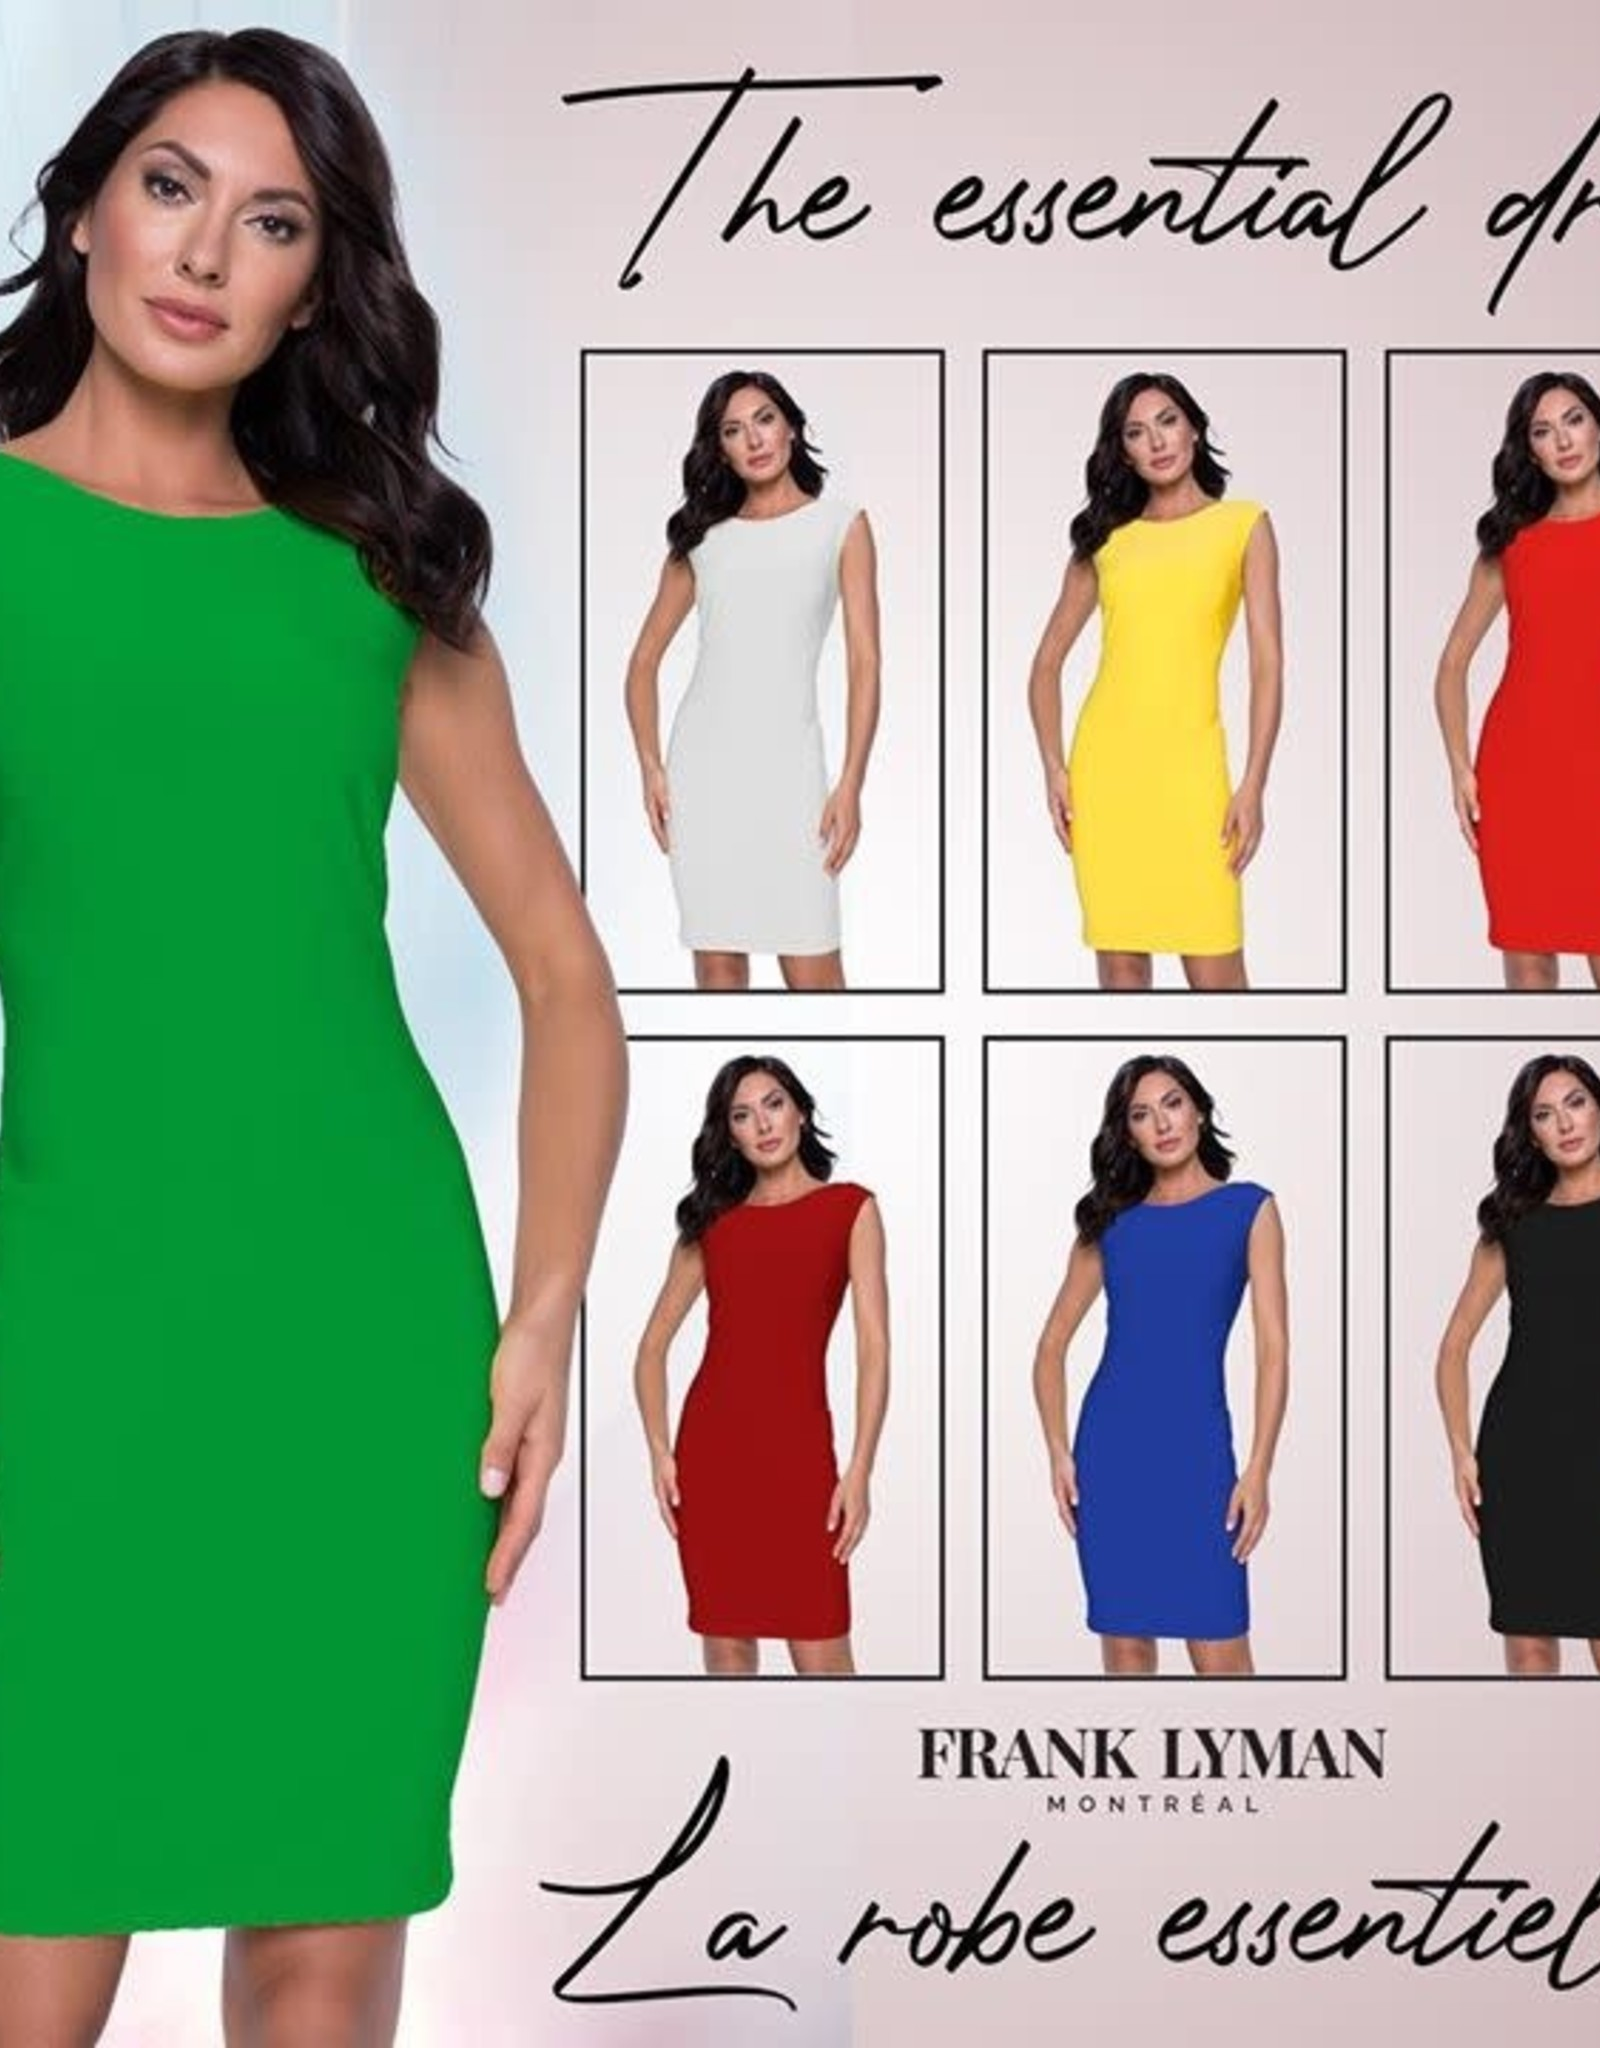 Frank Lyman 201046 Frank Lyman dress